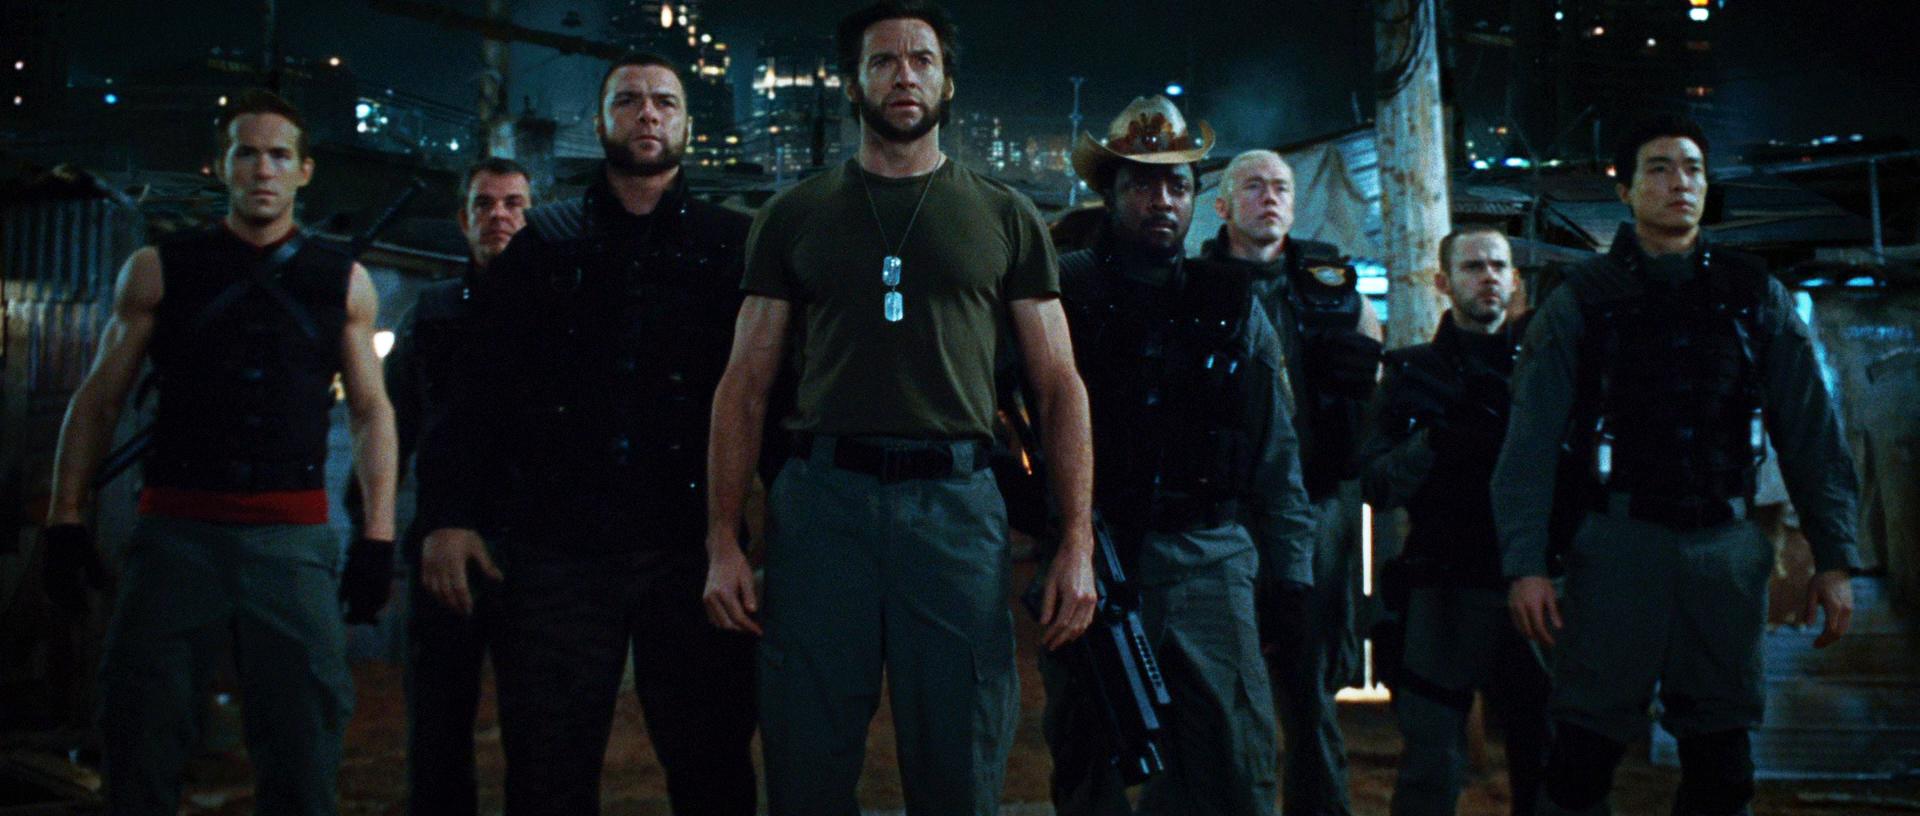 X Men First Class Magneto And Mystique Team X - X-Men Movies ...